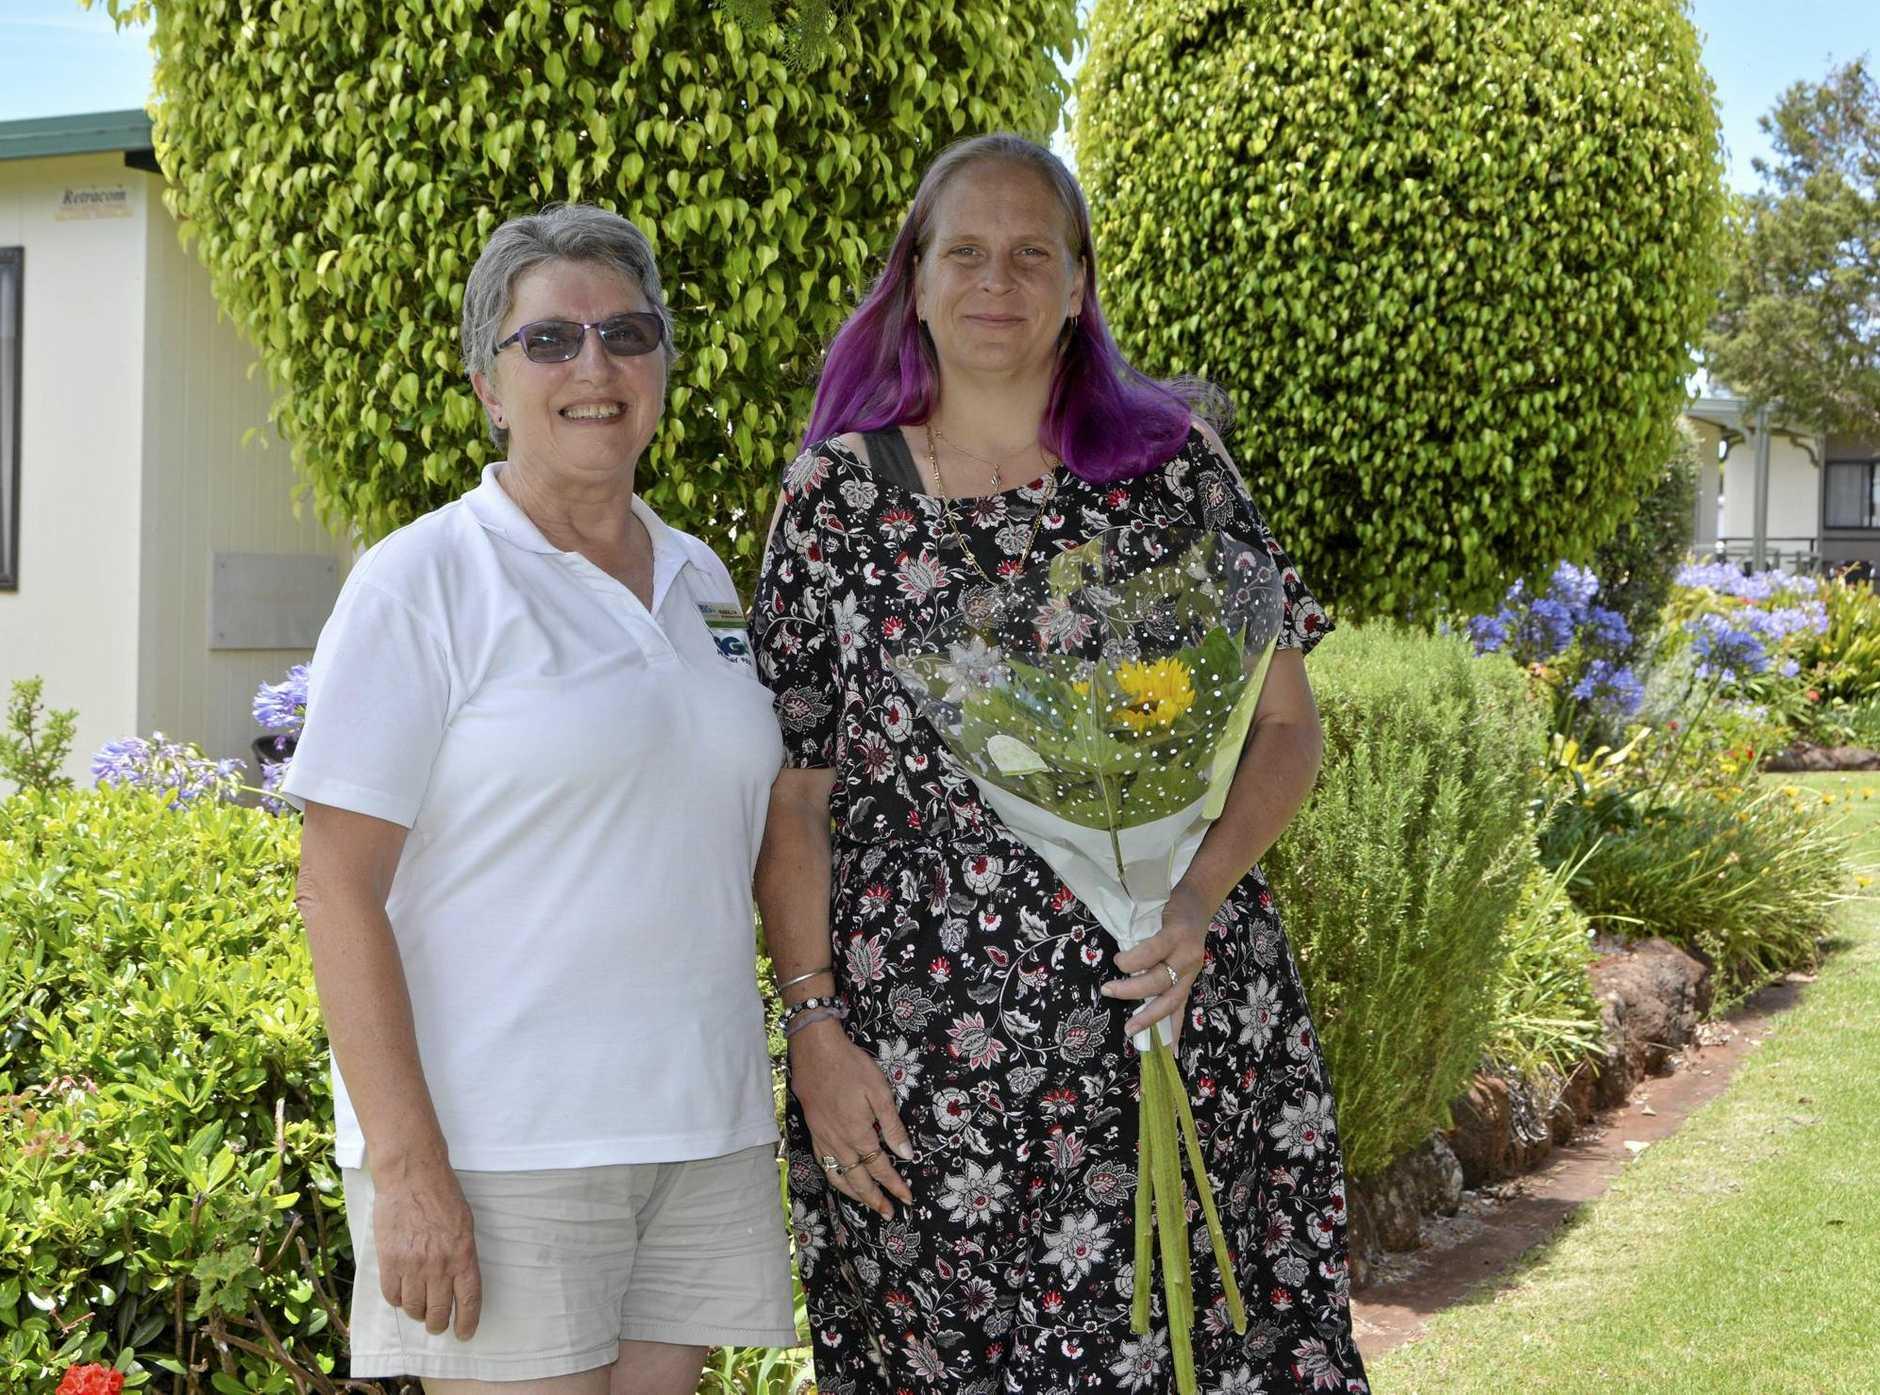 NICE GESTURE: Maralyn Middleton (left) thanked Michelle Wilson for returning her wedding tape.